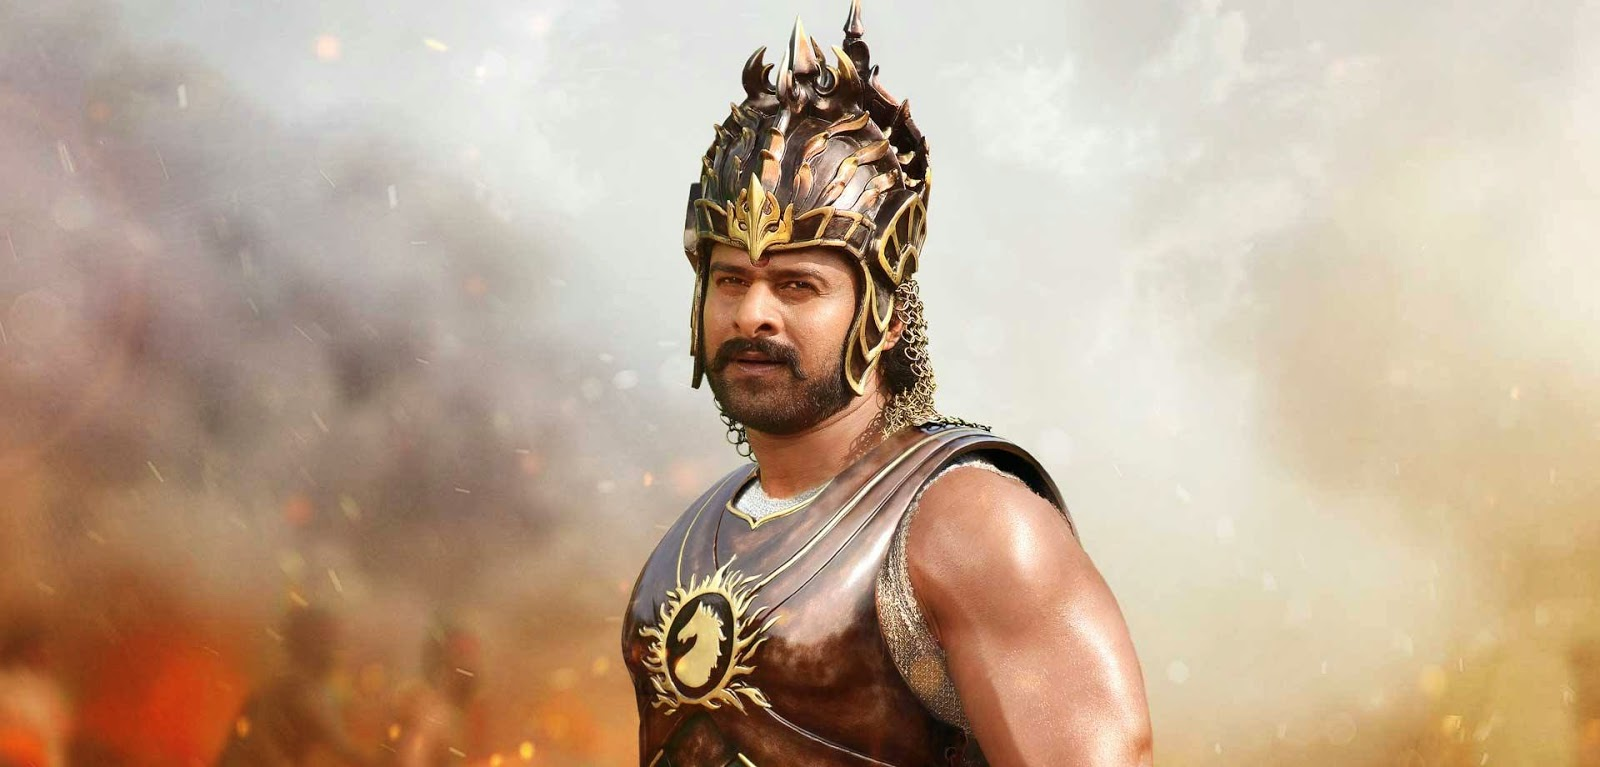 bahubali 2 hd movie download hindi dubbed